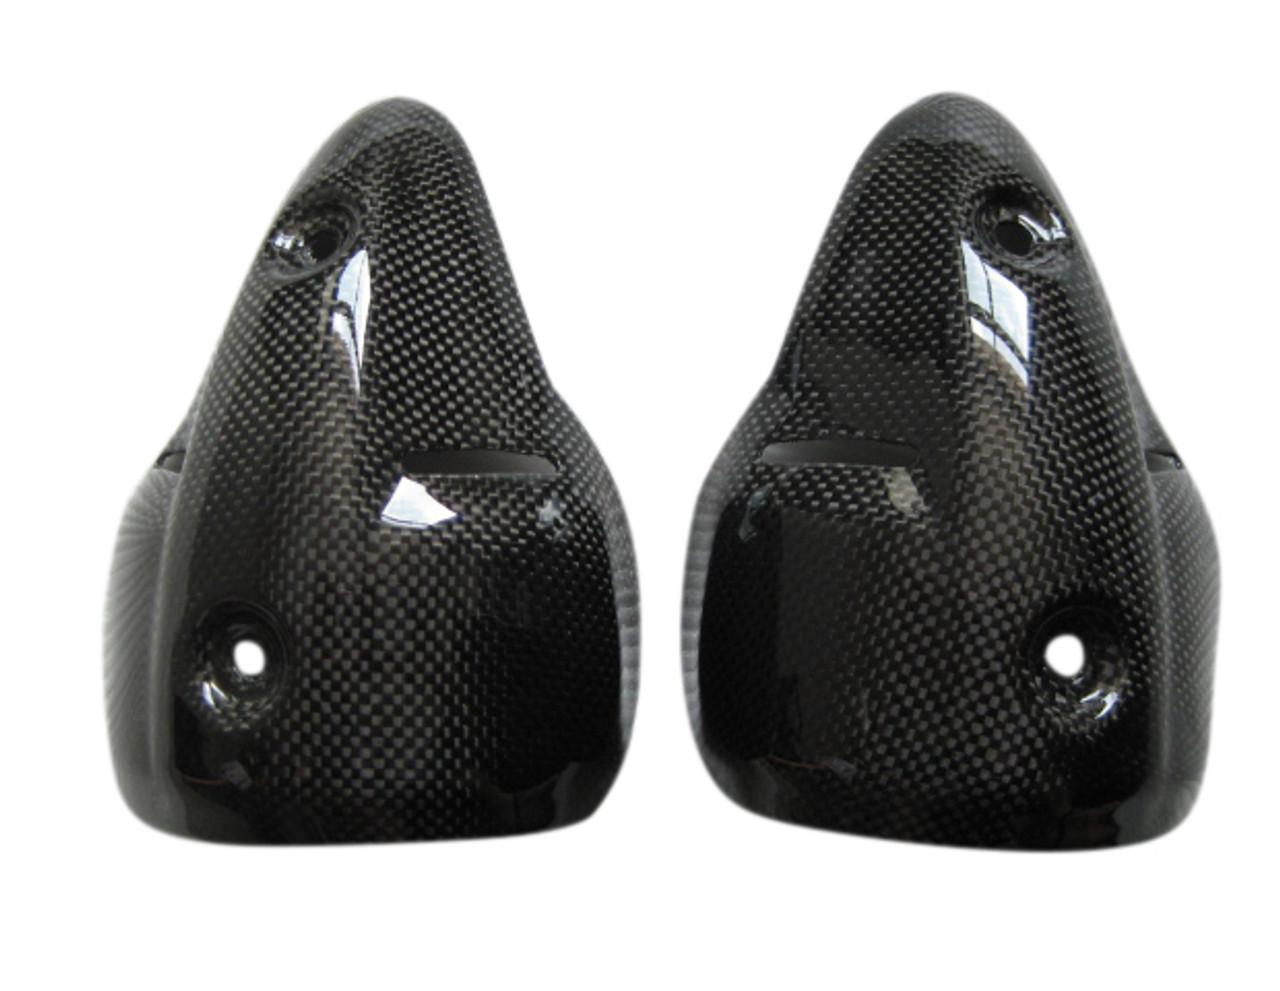 Glossy Plain Weave Carbon Fiber Silencer Guards/ Heat Shields for Ducati Monster 696 / 796 / 1100  07-10